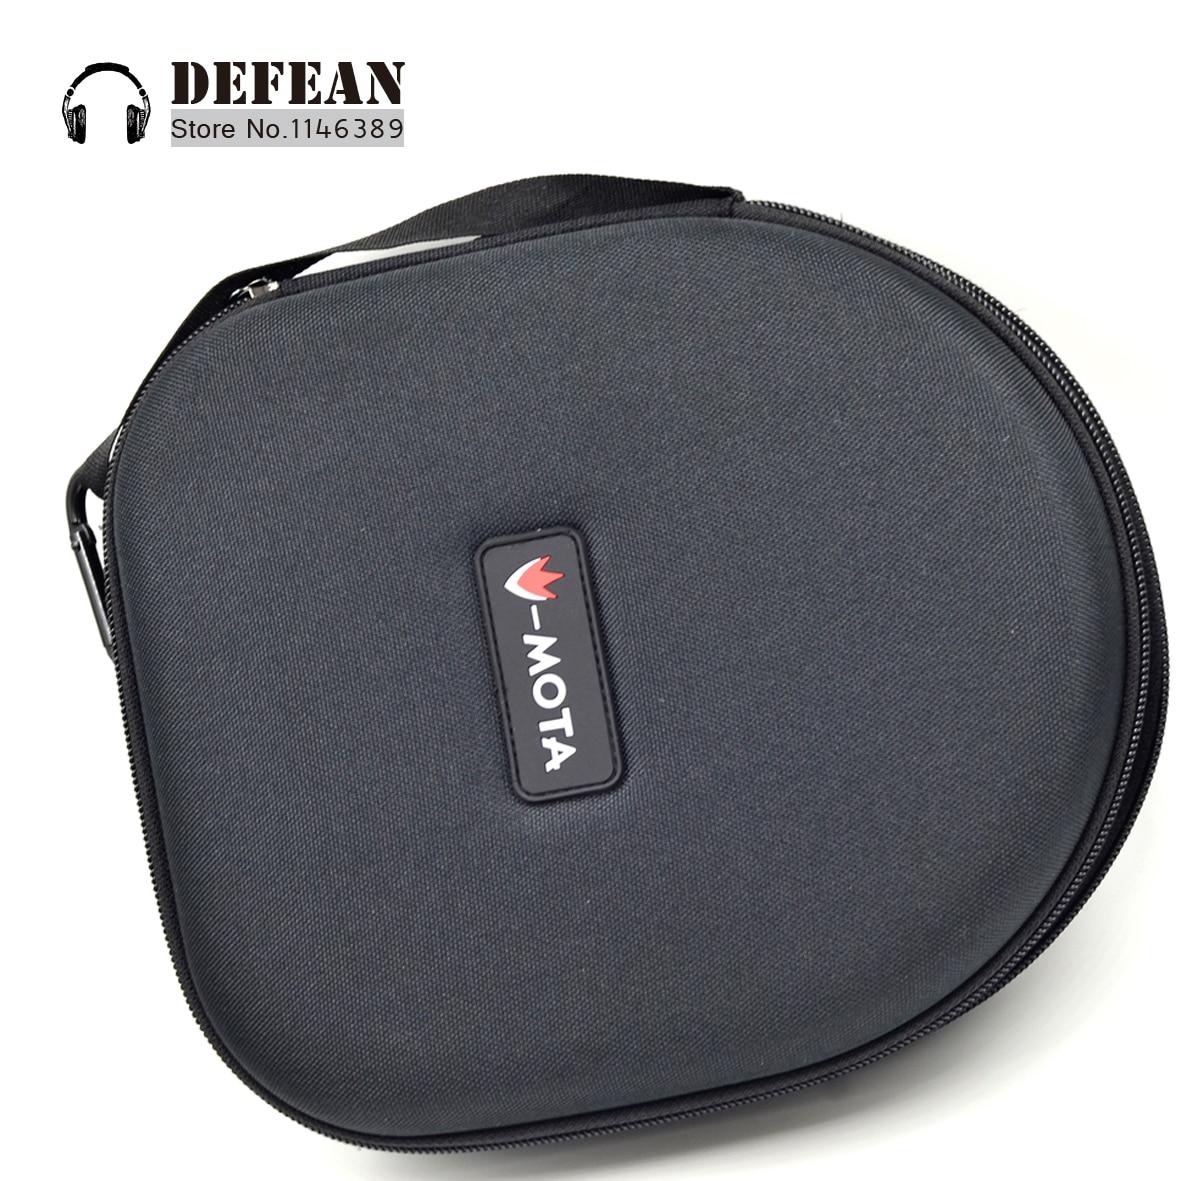 Pack de funda rígida para auriculares Sony NWZ-WH303 nwz-wh505 nwz WH303 WH505